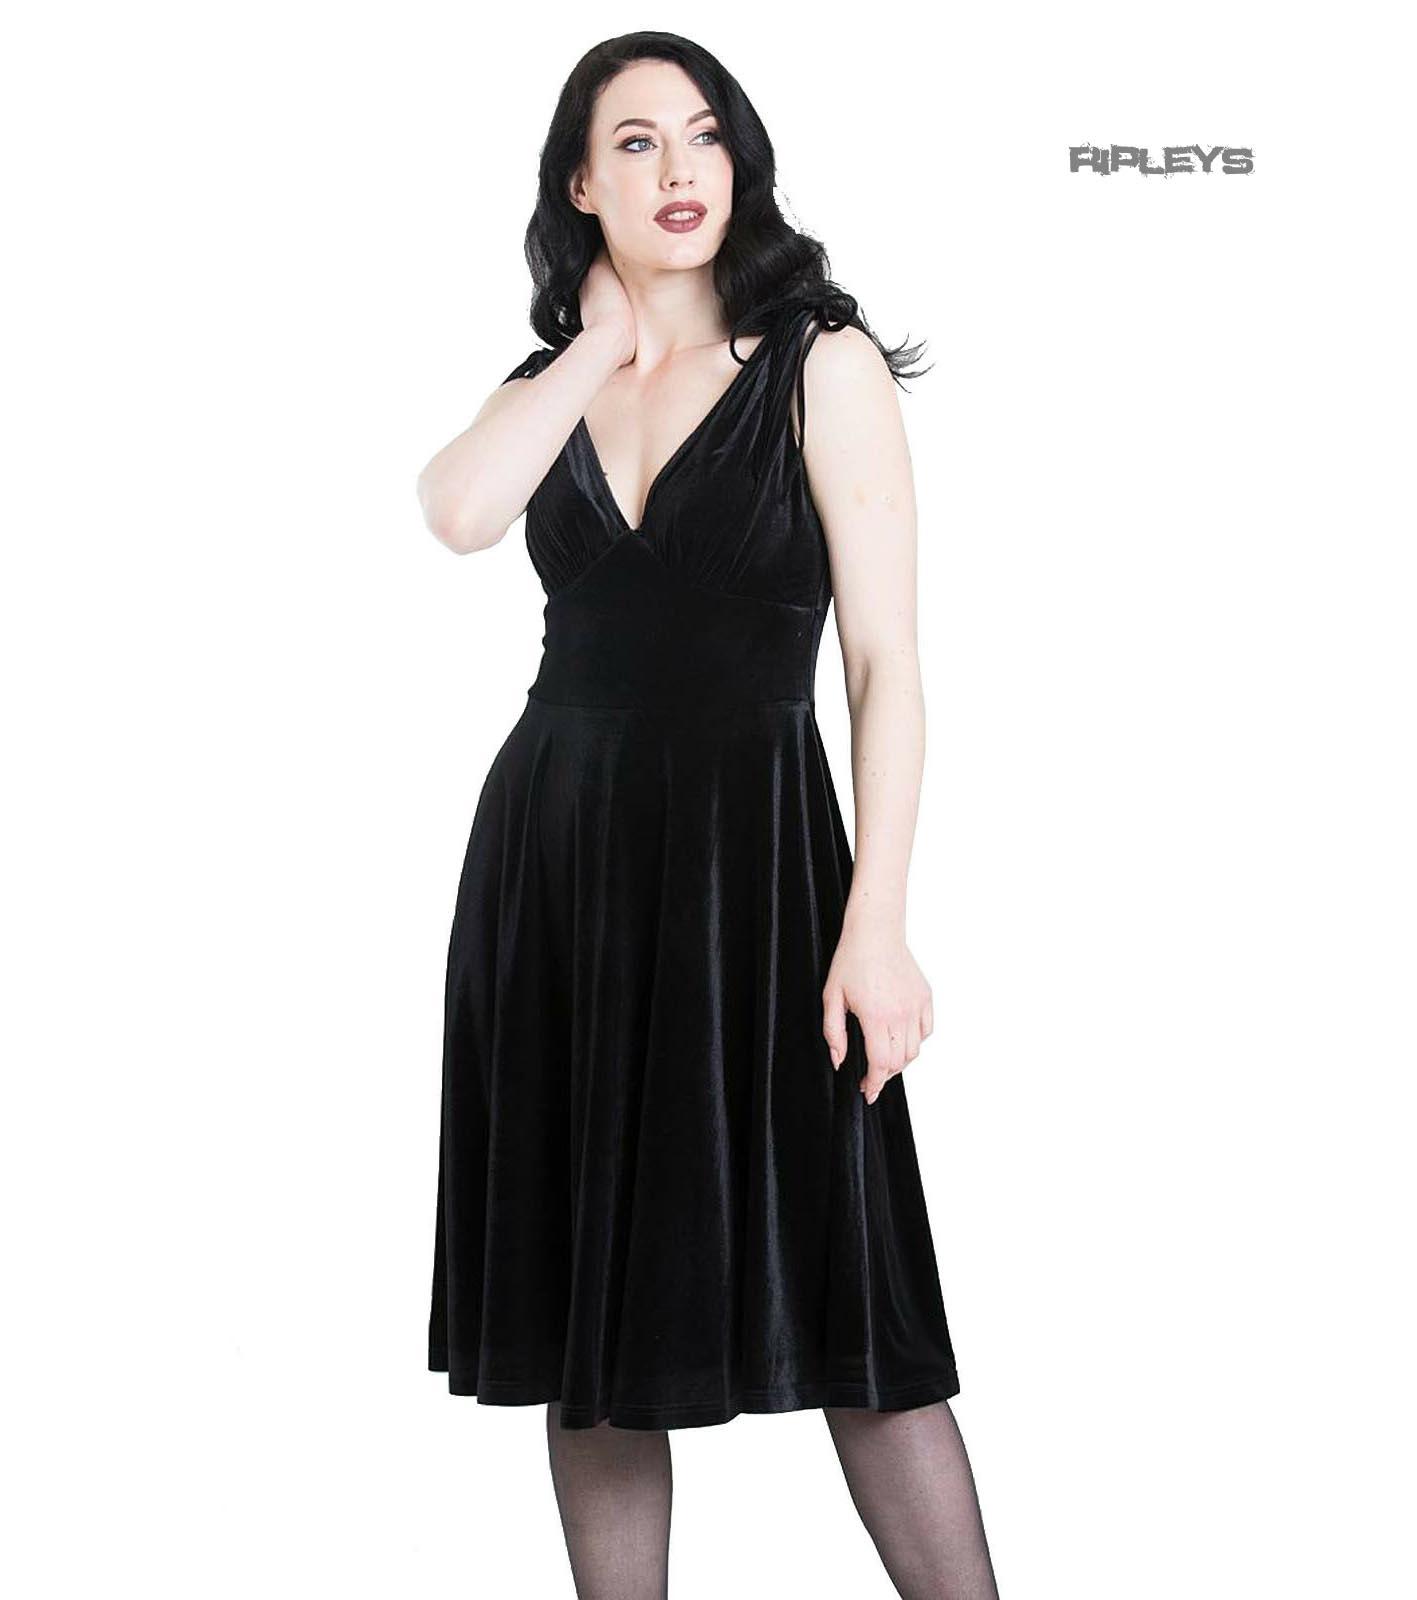 Hell-Bunny-40s-50s-Elegant-Pin-Up-Dress-MELINA-Crushed-Velvet-Black-All-Sizes thumbnail 6